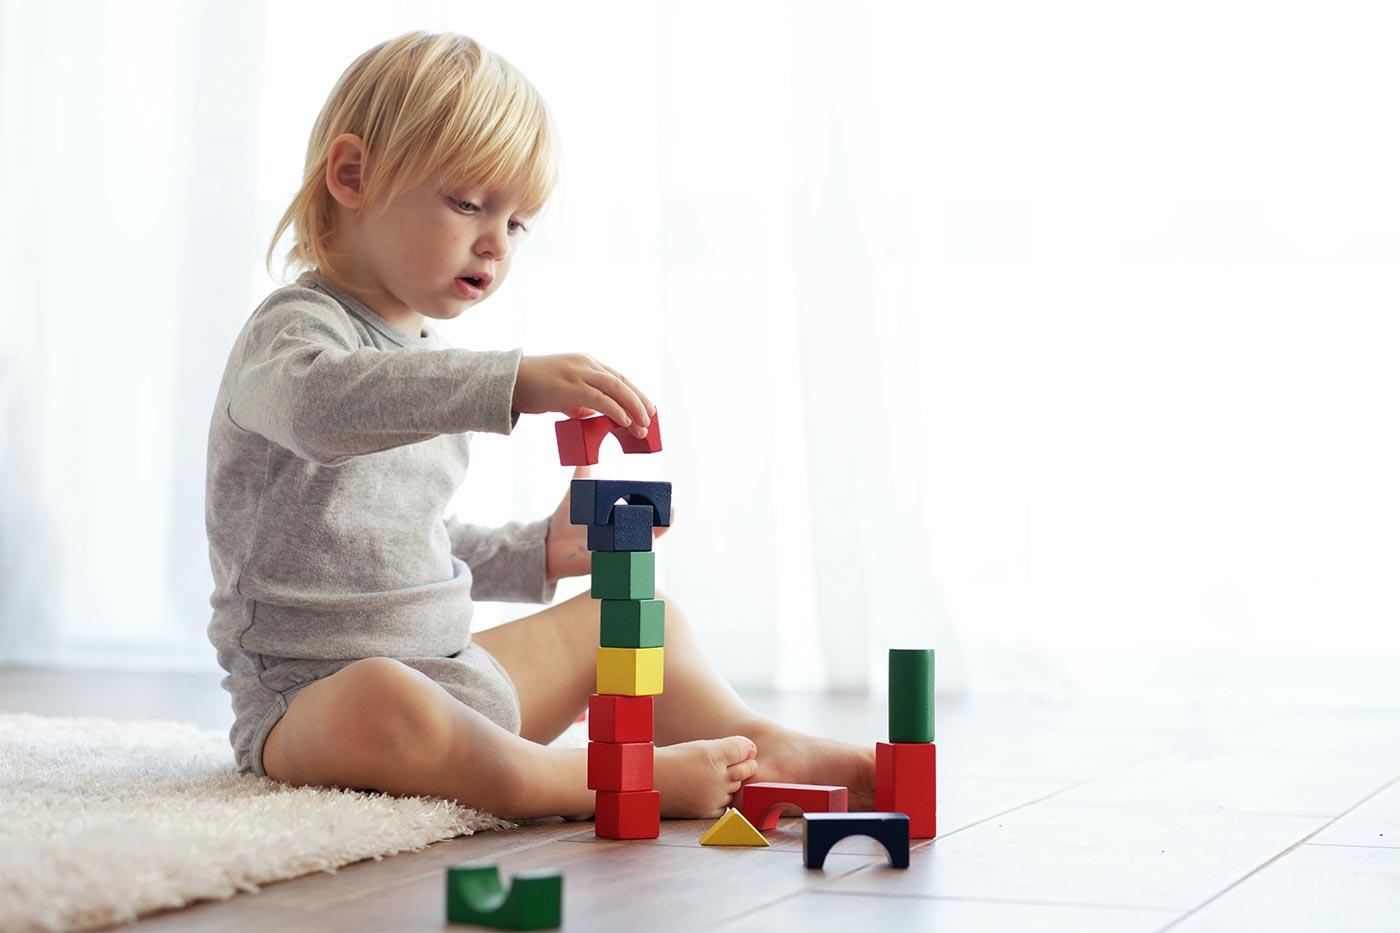 Child stacking wooden blocks